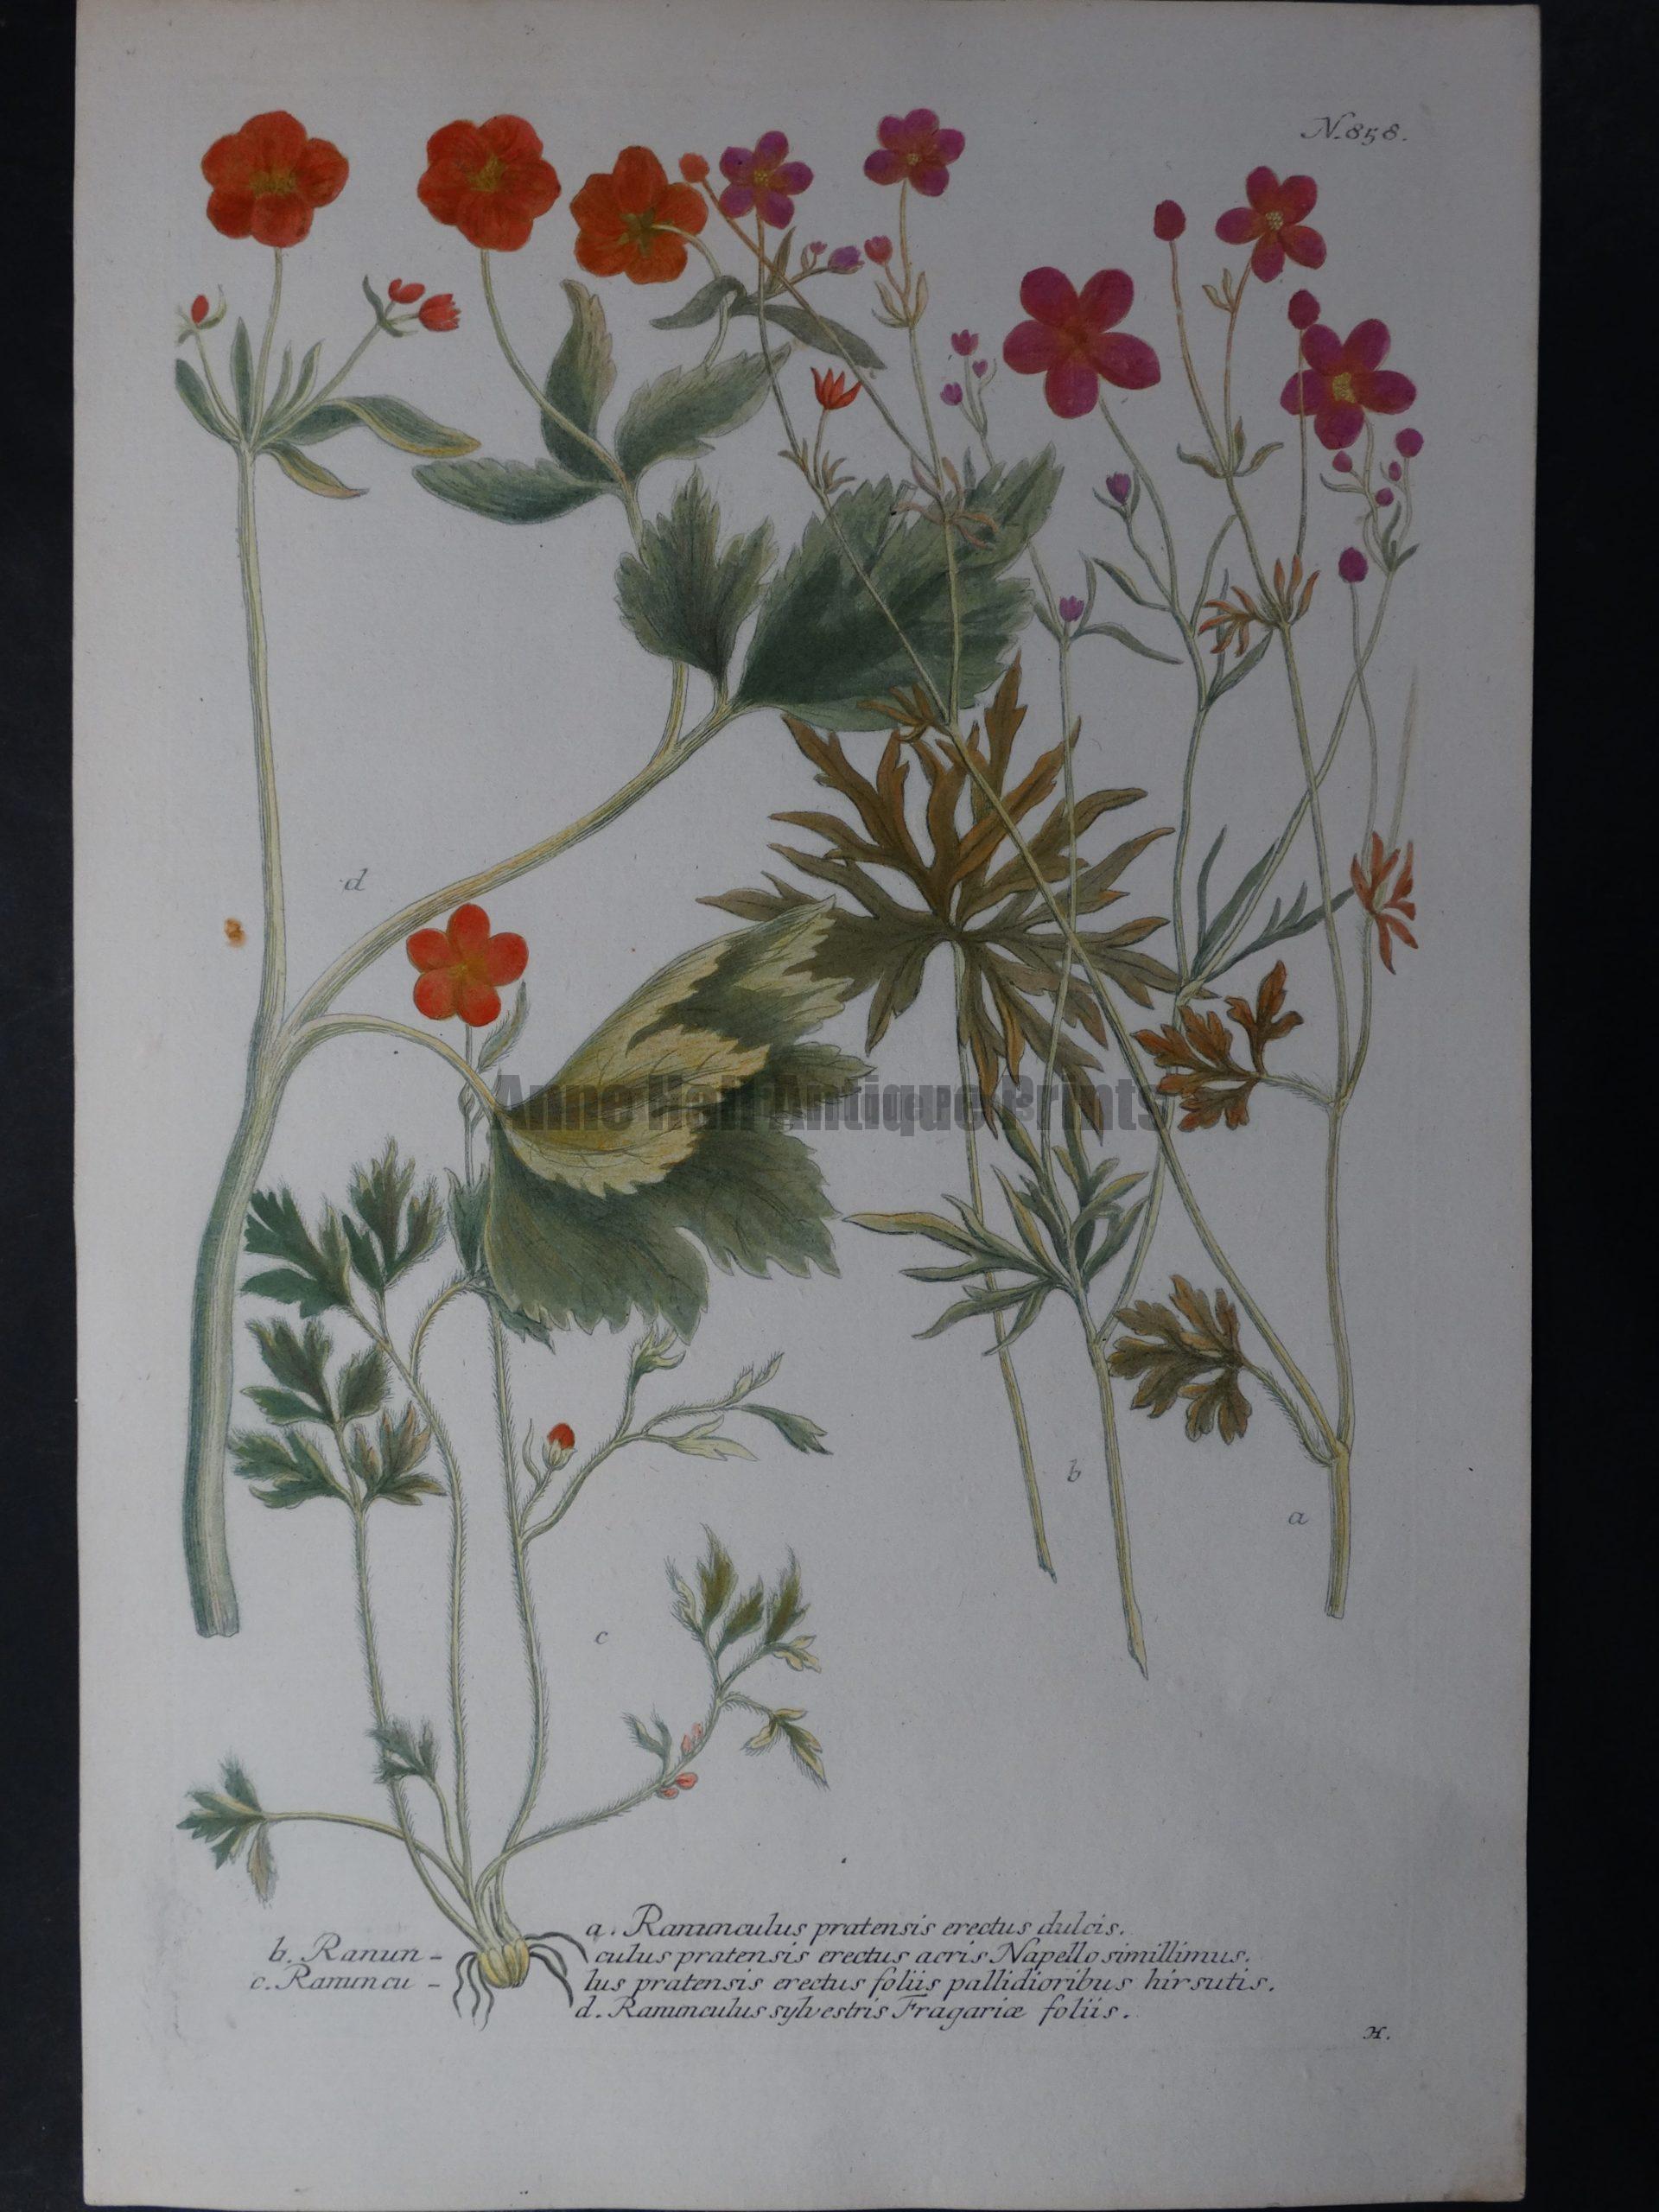 Weinmann Ranun 858 Johann Wilhelm Weinmann Phytanthoza iconographia. 1737-1745.  9.5x15.25 in.